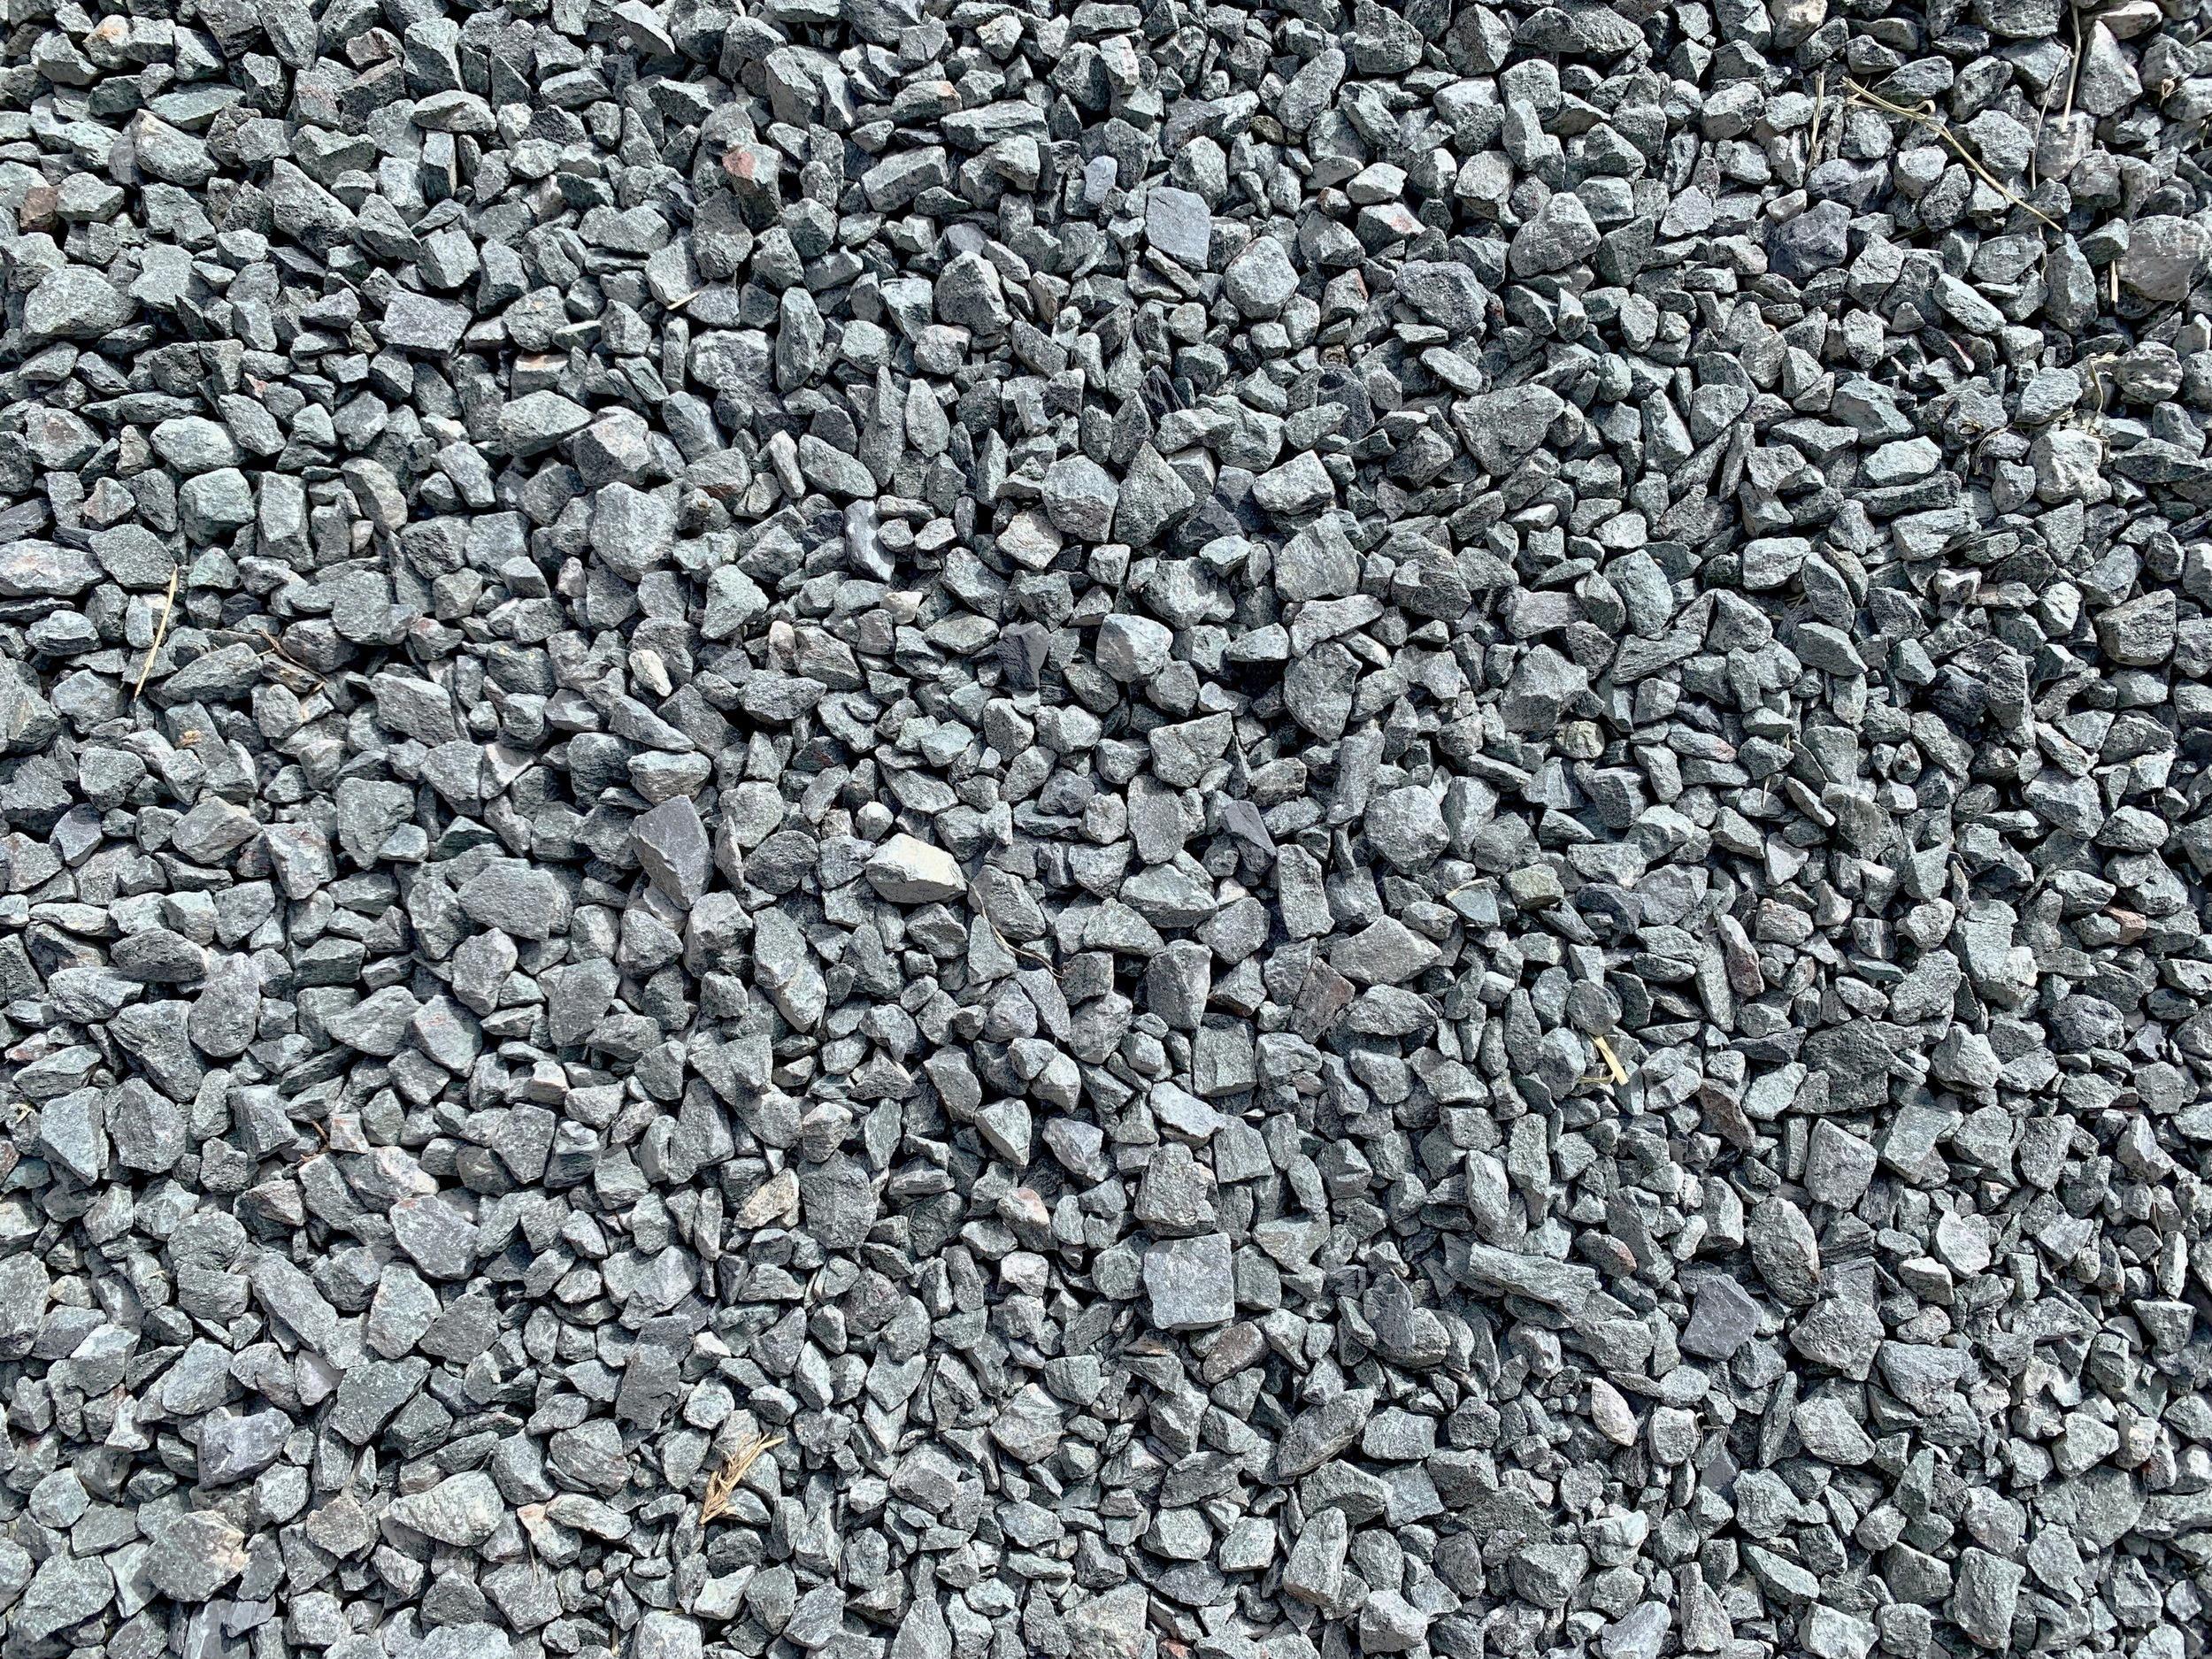 decorative gravel Blue 10mm / 20mm / 40mm / 50-75mm / 75-150mm / 150-300mm